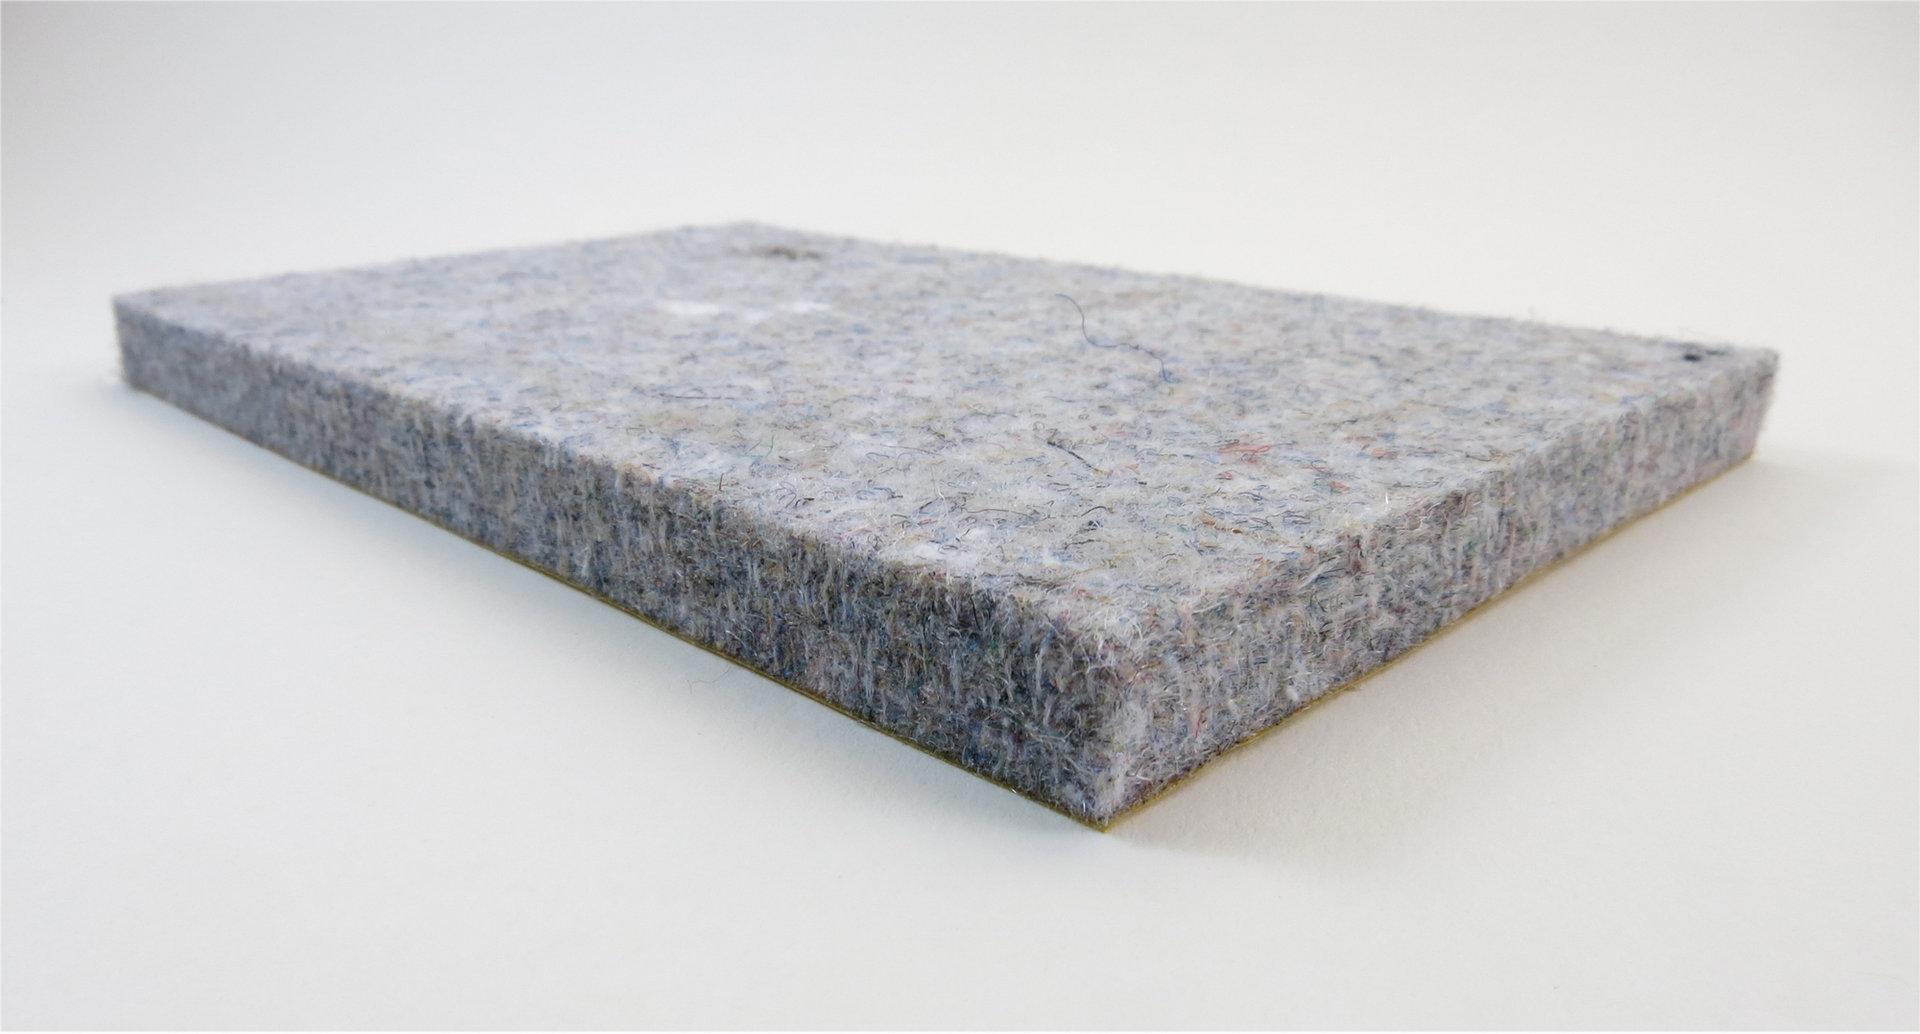 Filzgleiter quadratisch ab 5x5cm, 10mm dick | selbstklebend | grau meliert